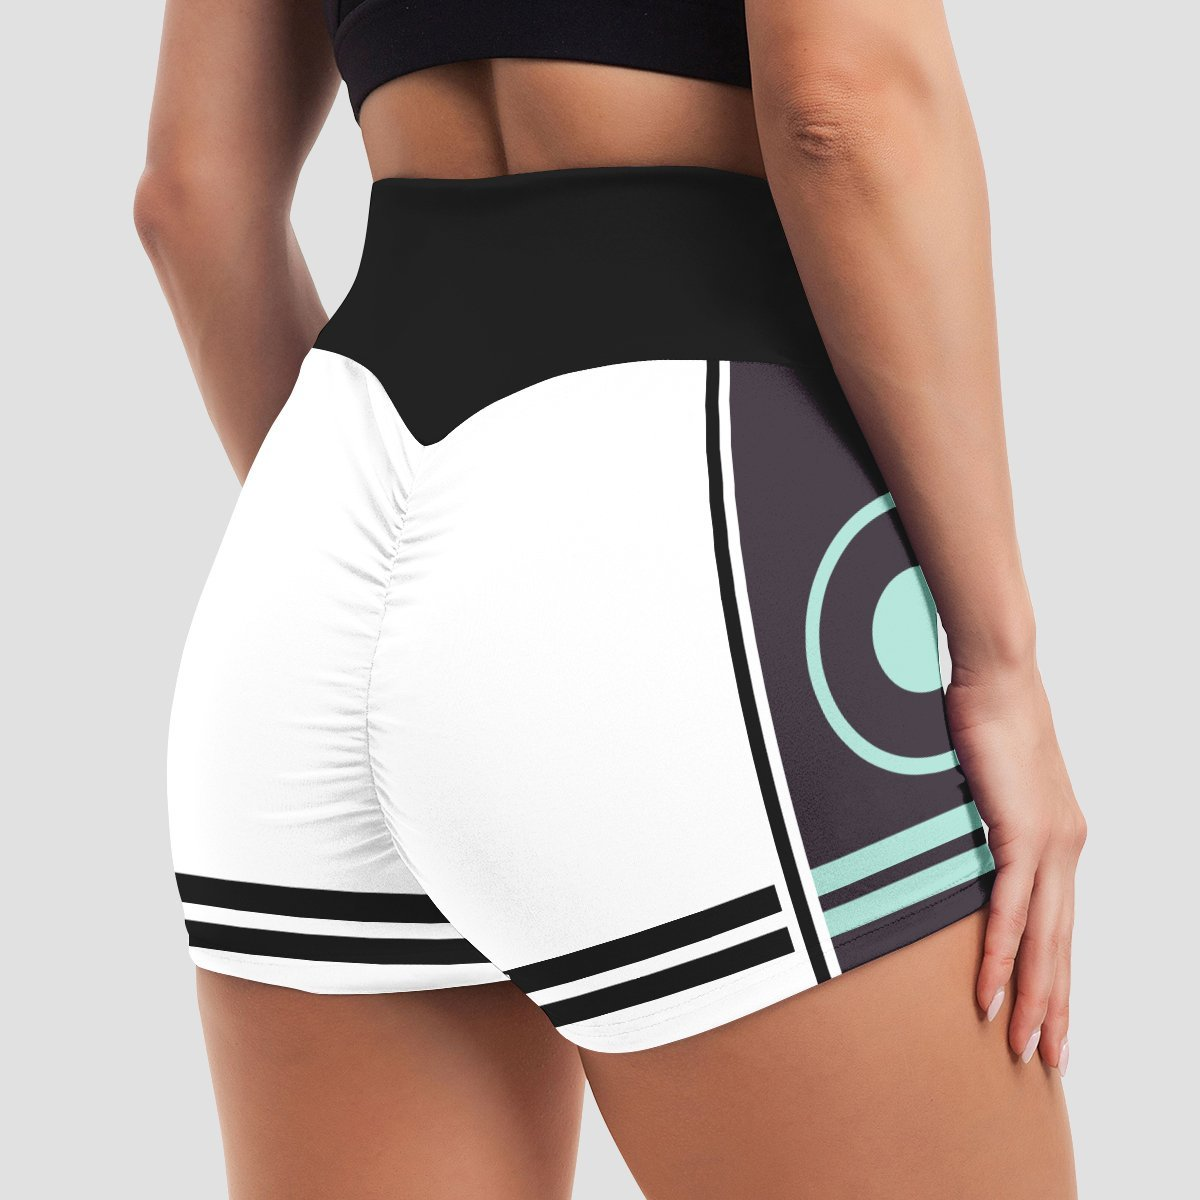 legend sukuna active wear set 763106 - Anime Swimsuits